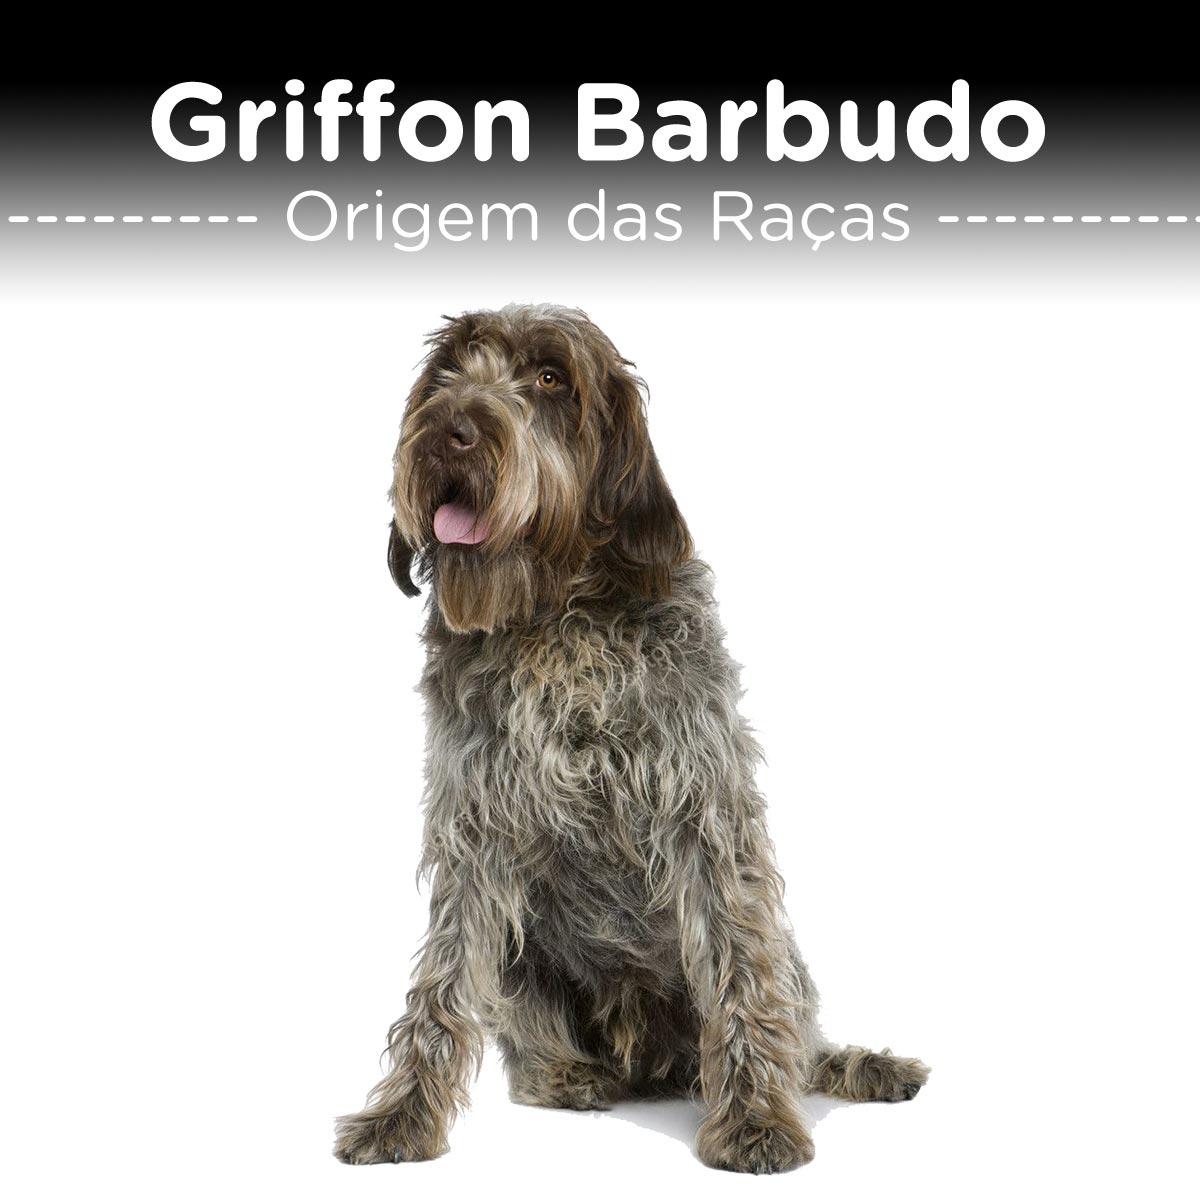 Griffon Barbudo